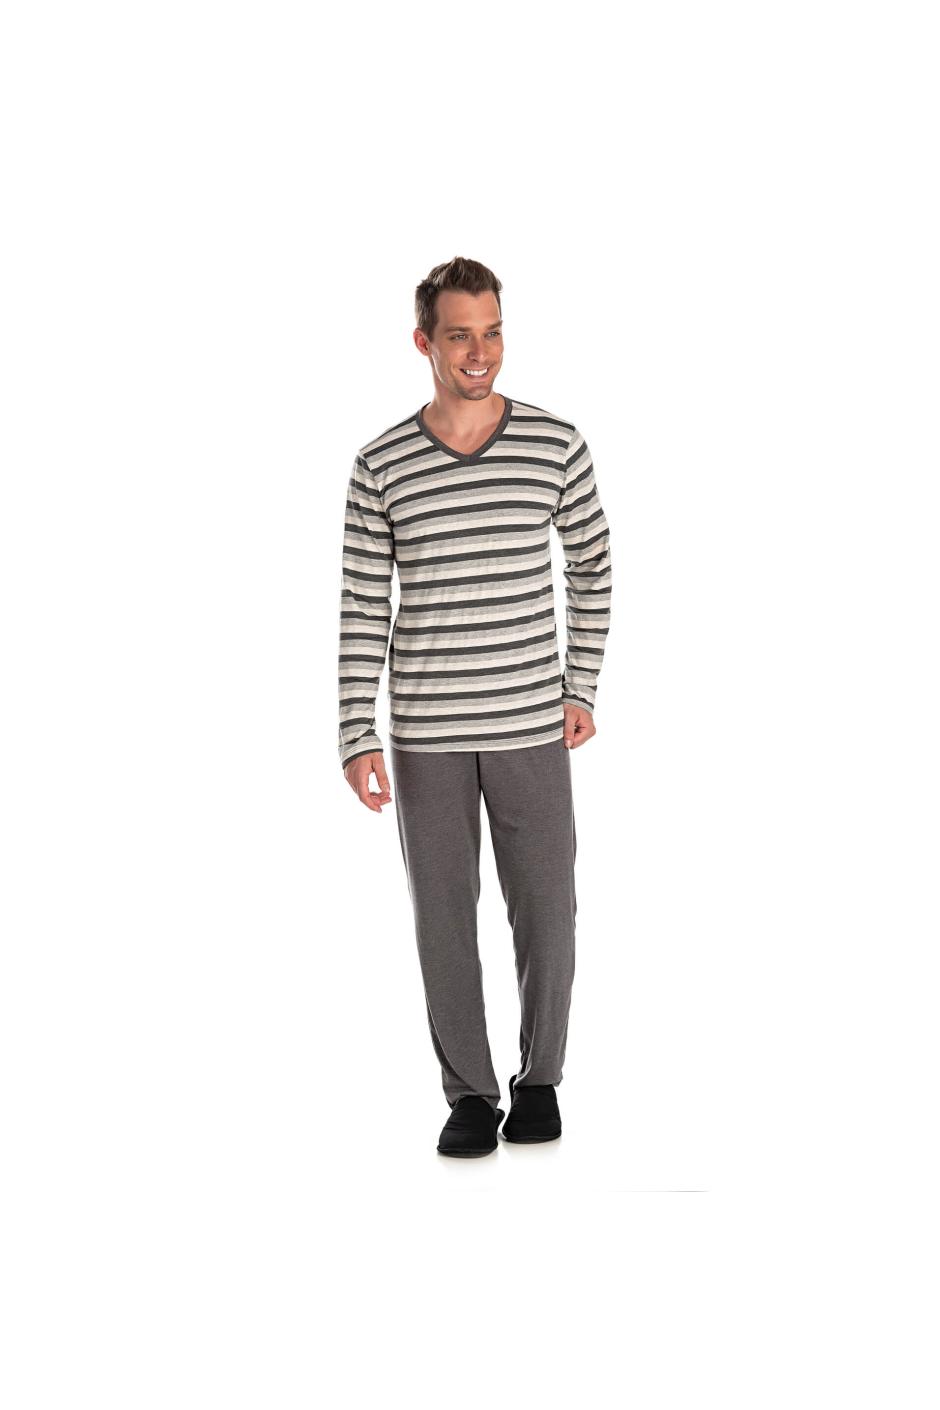 014/A - Pijama Adulto Masculino Listrado